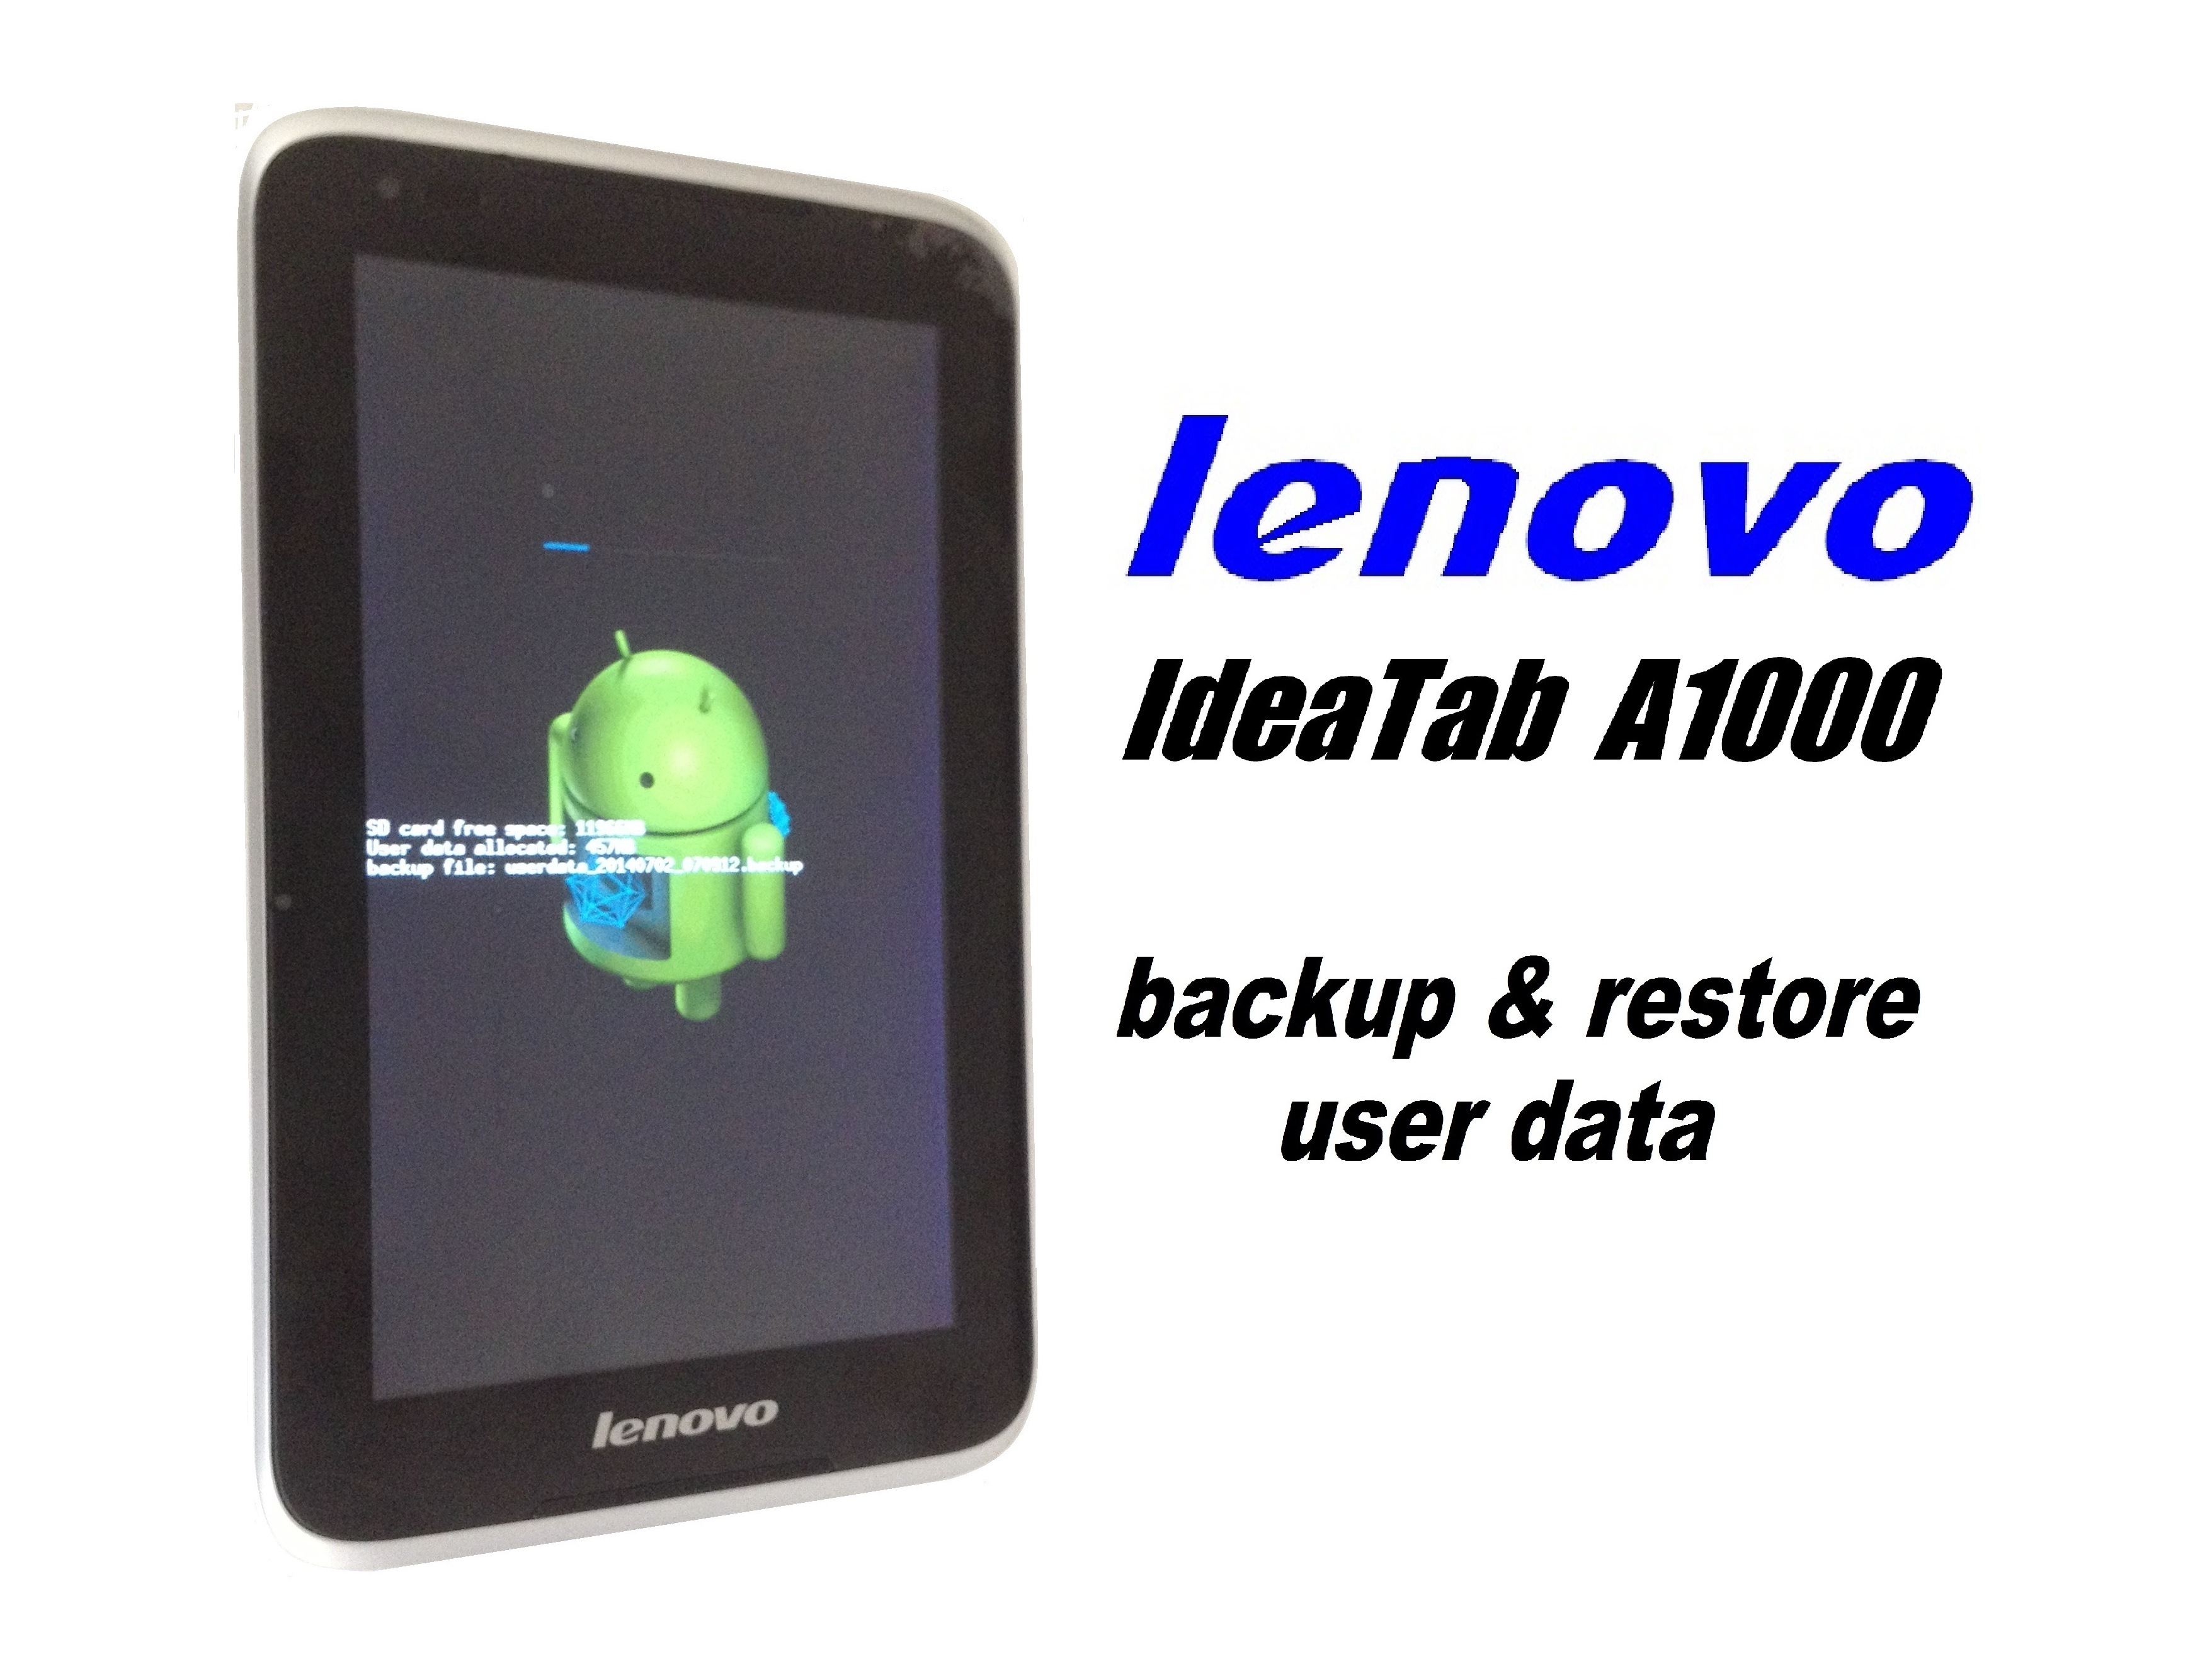 Lenovo Ideatab A1000 Backup Restore